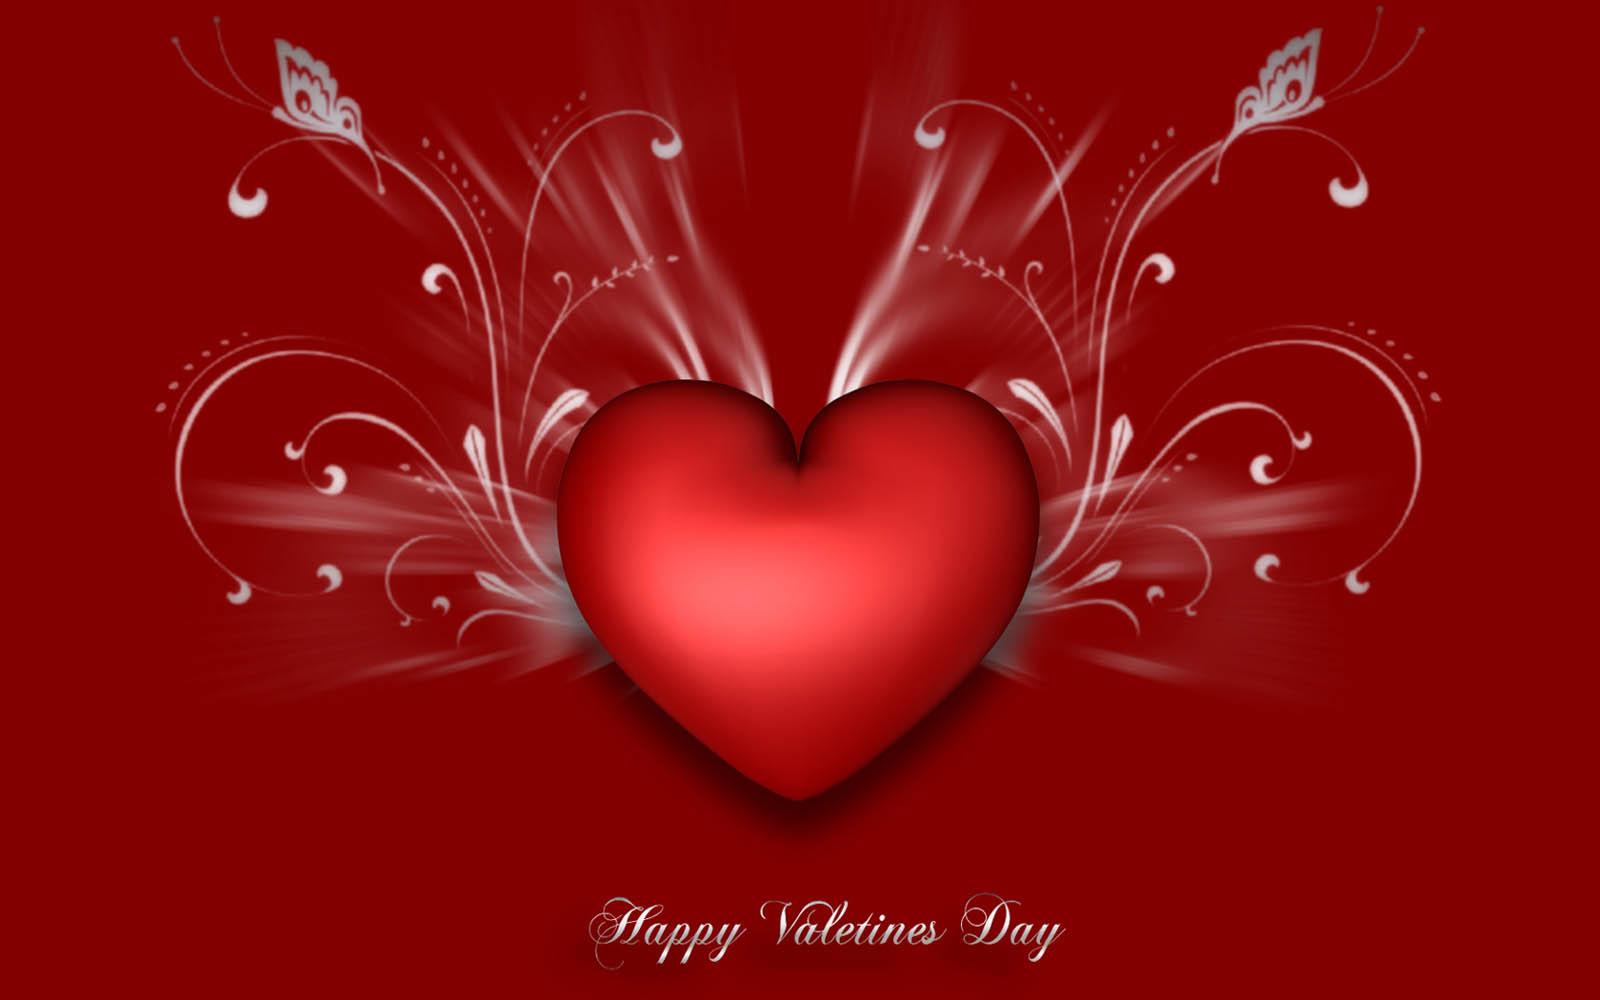 valentines day background wallpaper - photo #3